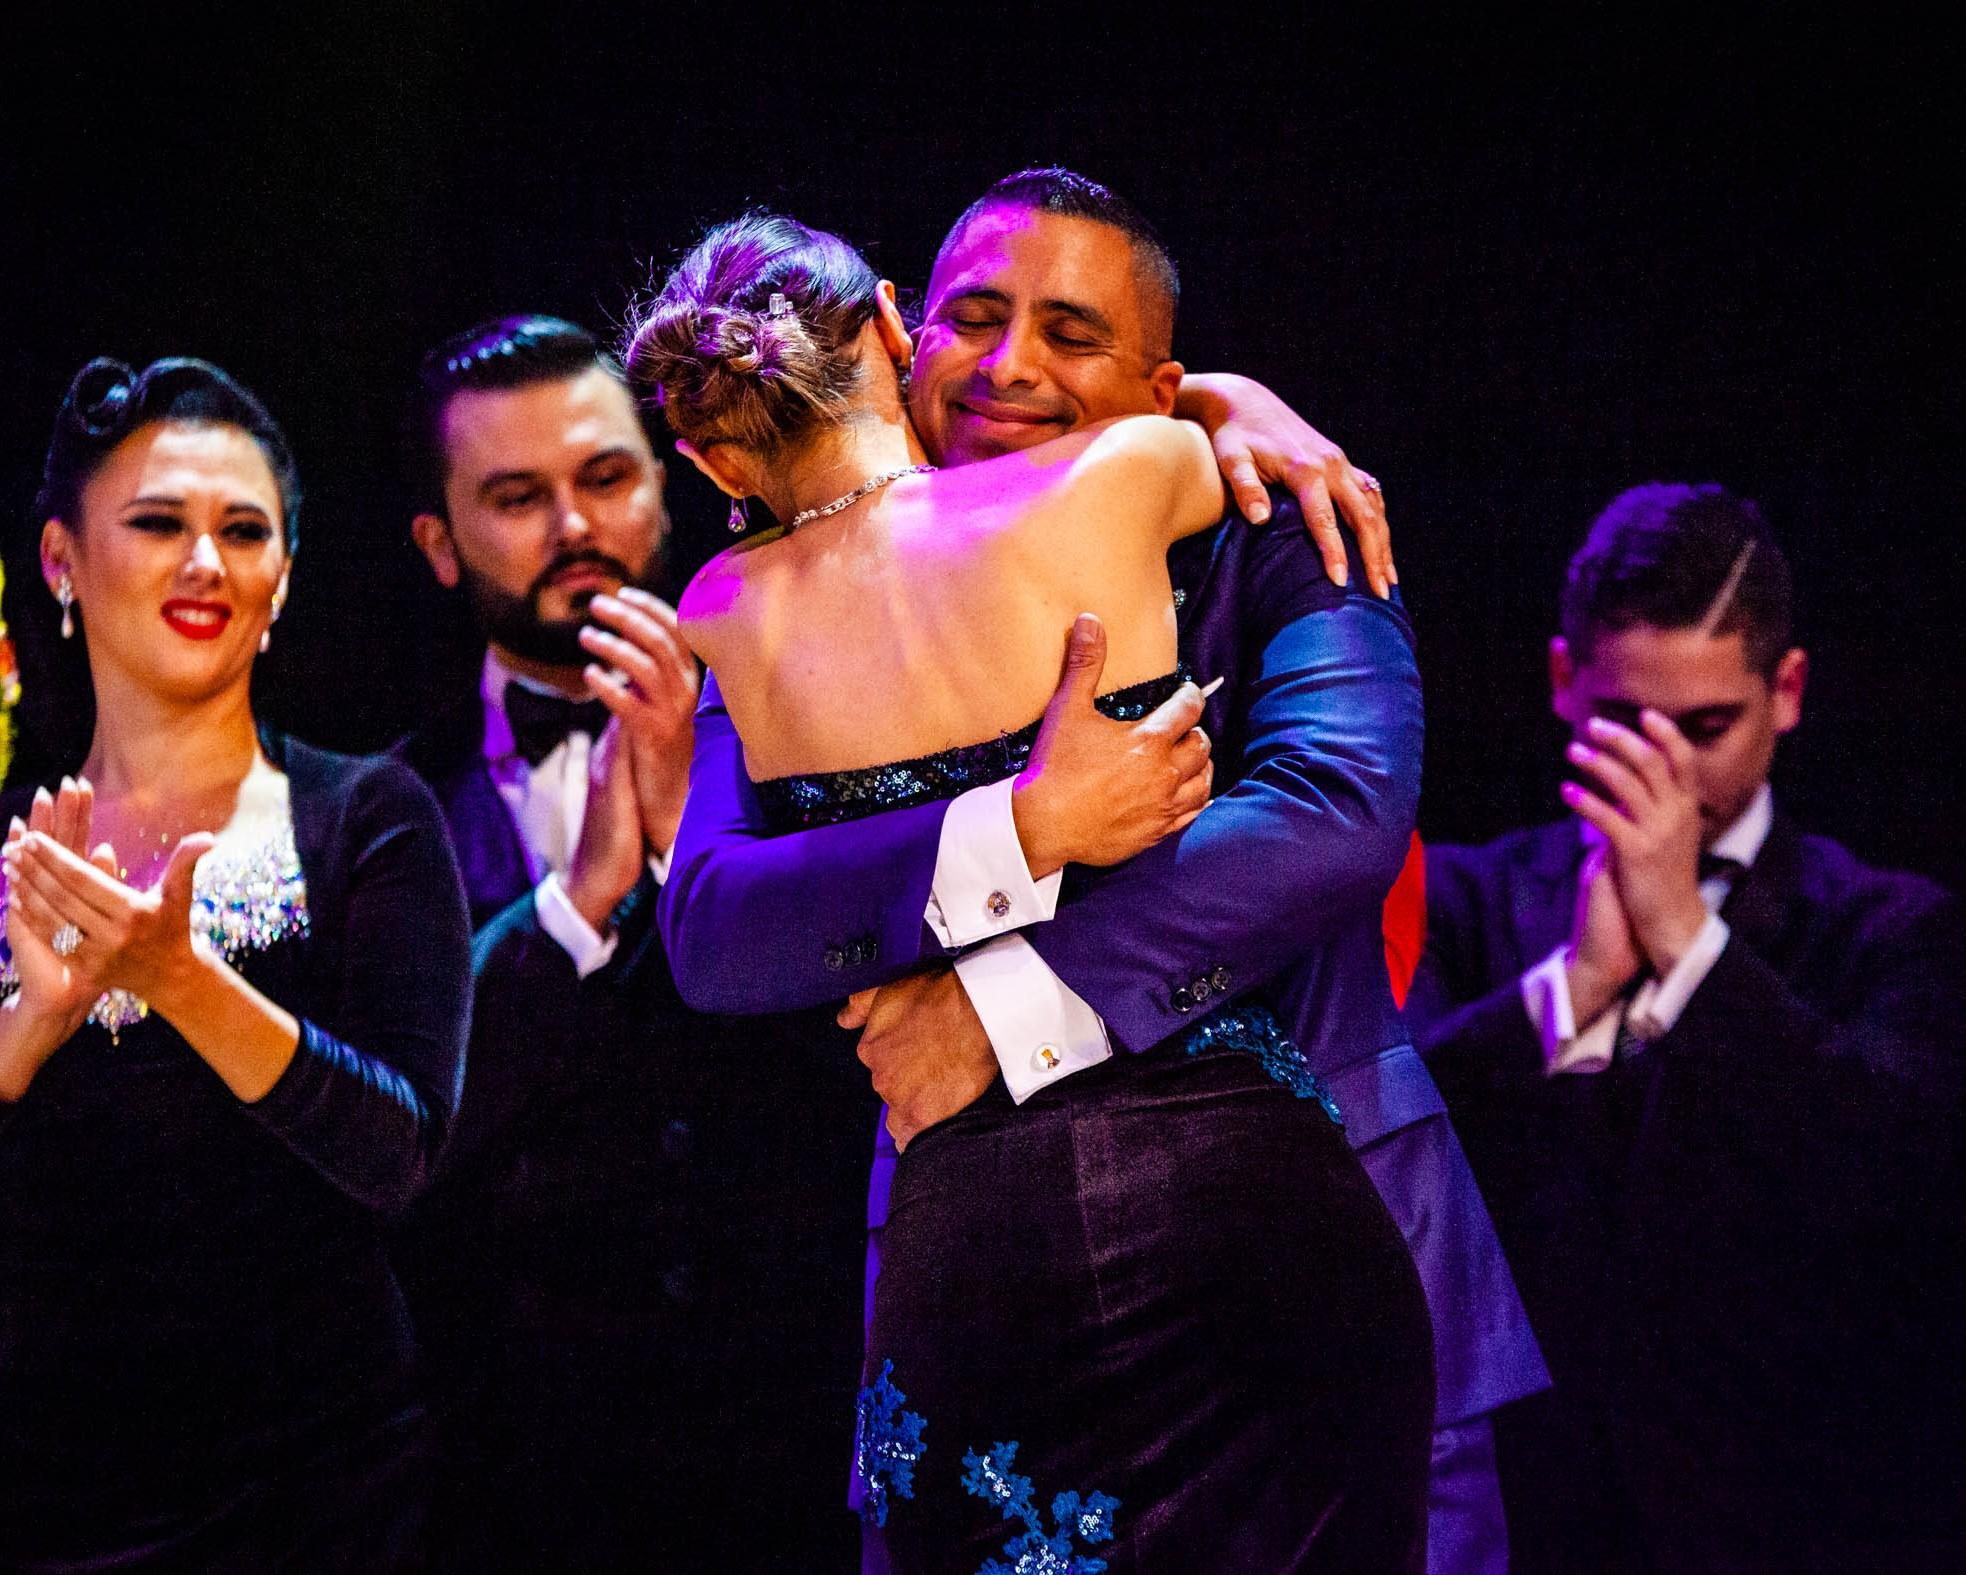 Mondiali di tango 2019 Buenos Aires vincitori pista Agustina Piaggio Maksim Gerasimov